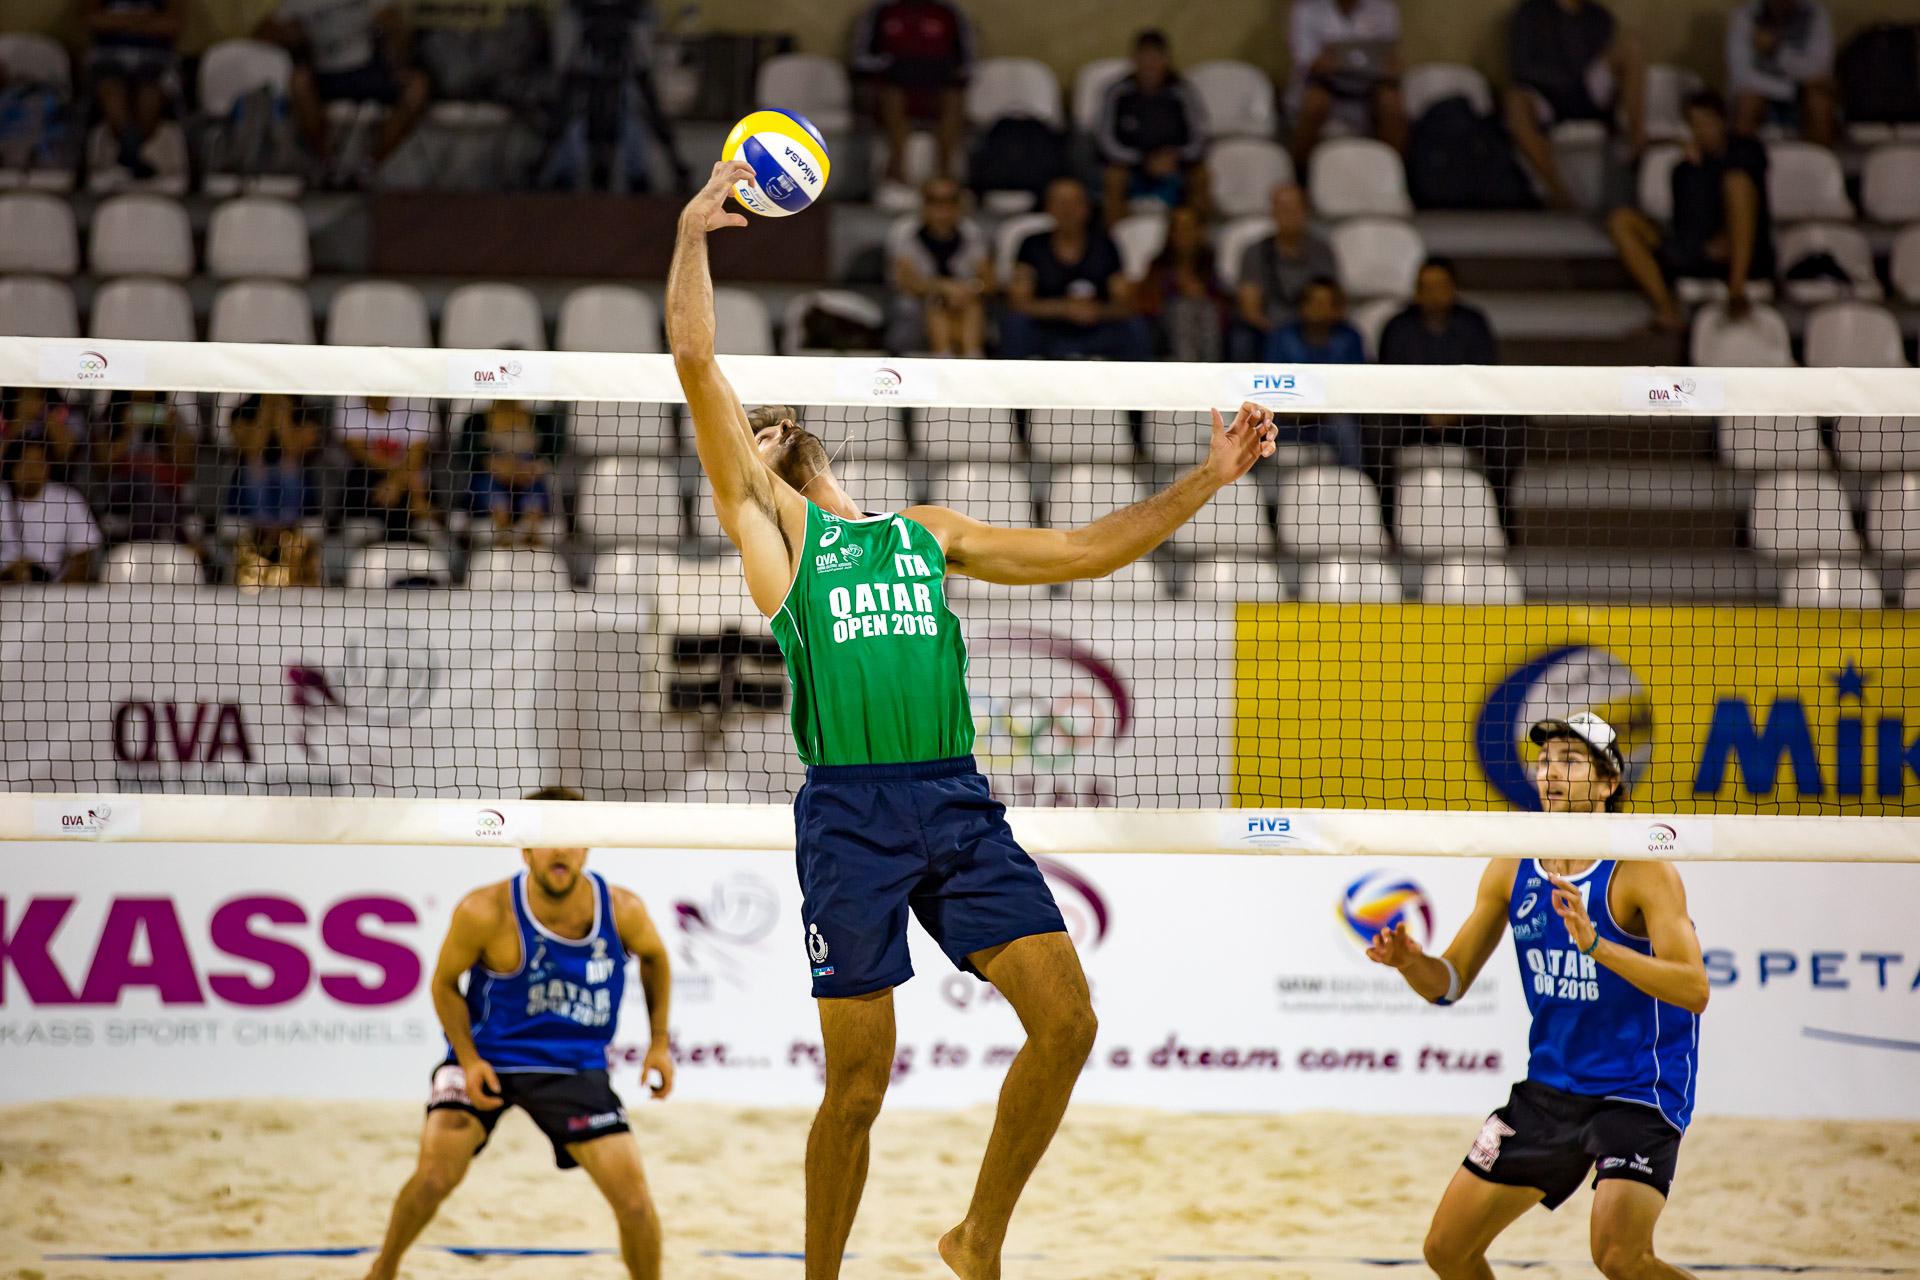 FIVB Beach Volleyball Qatar Open